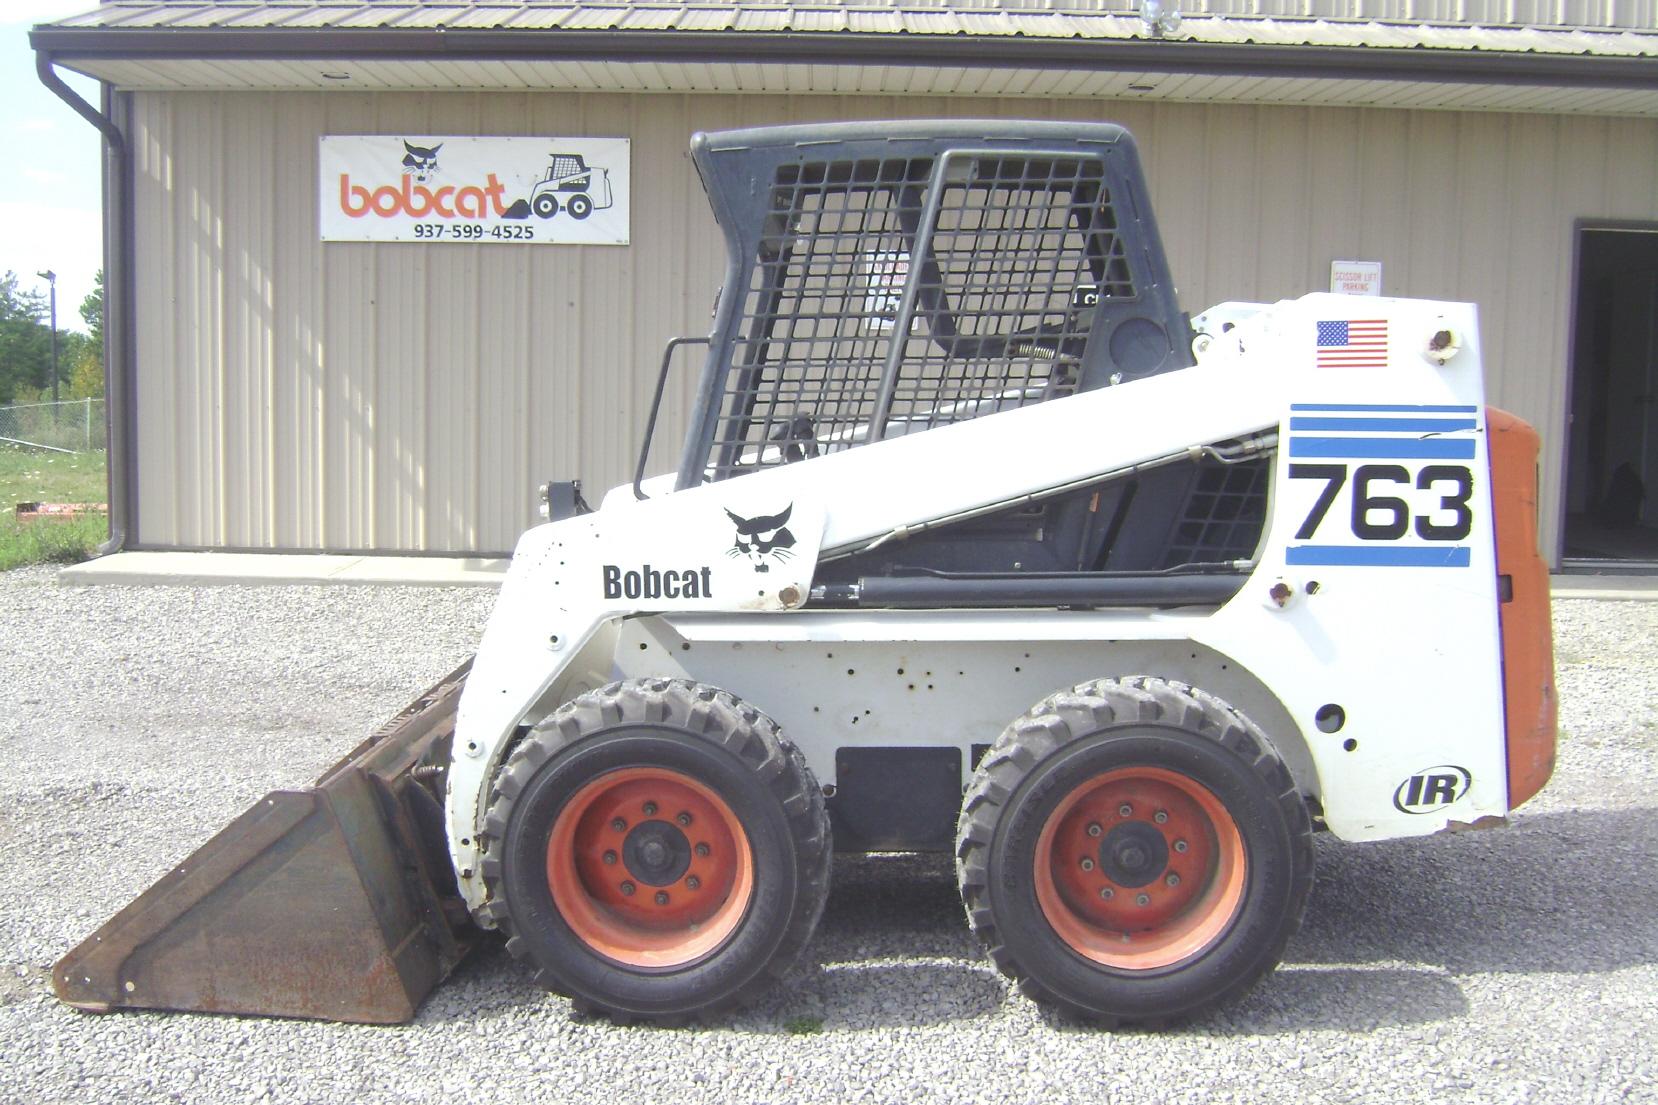 Bobcat 763 - specs, photos, videos and more on TopWorldAuto